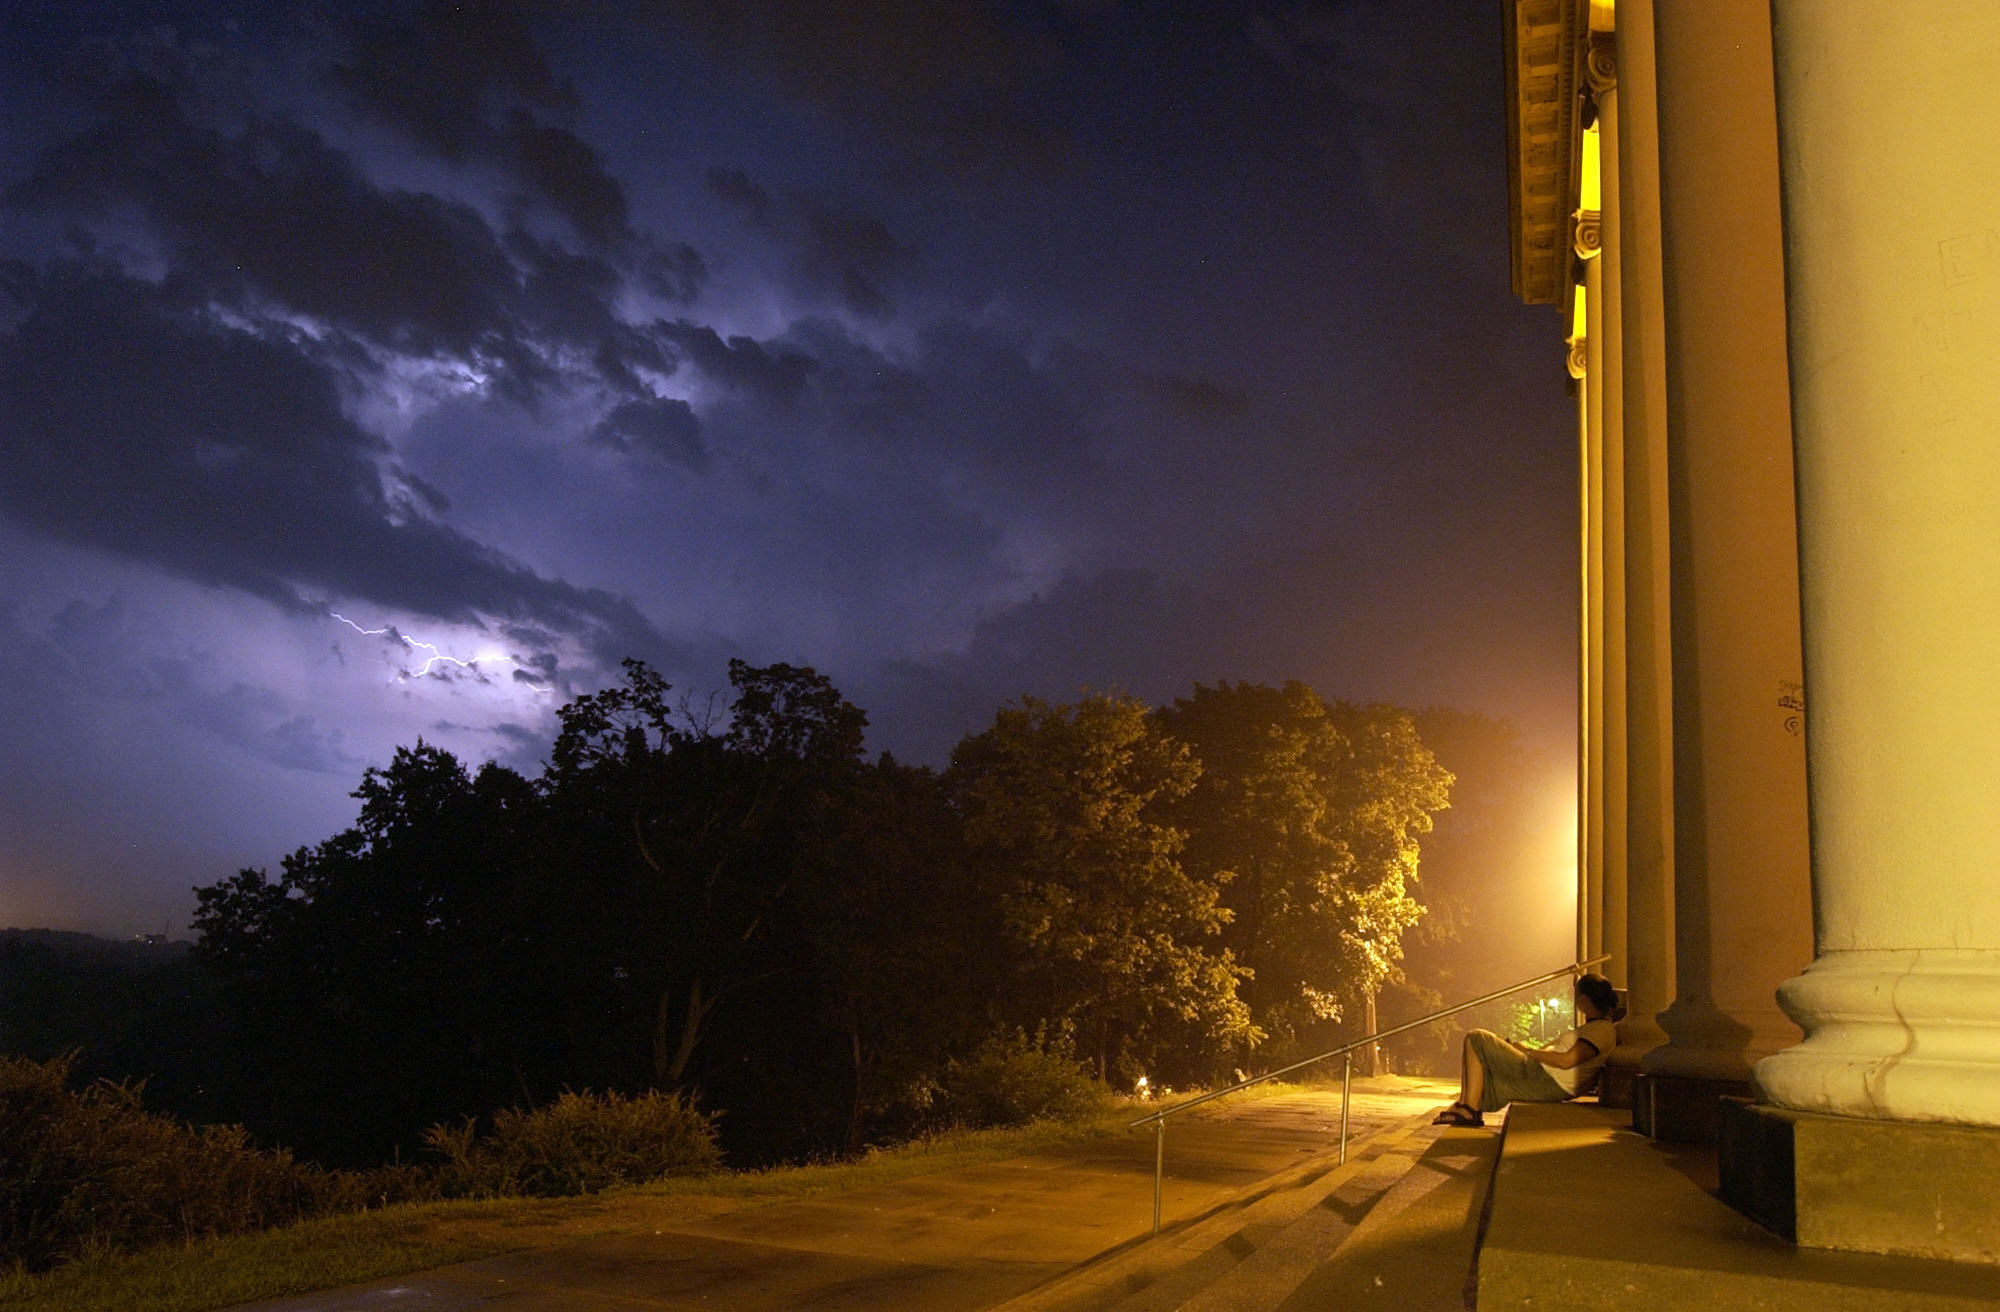 lightning-kalamazoo-mark-bialek-copy